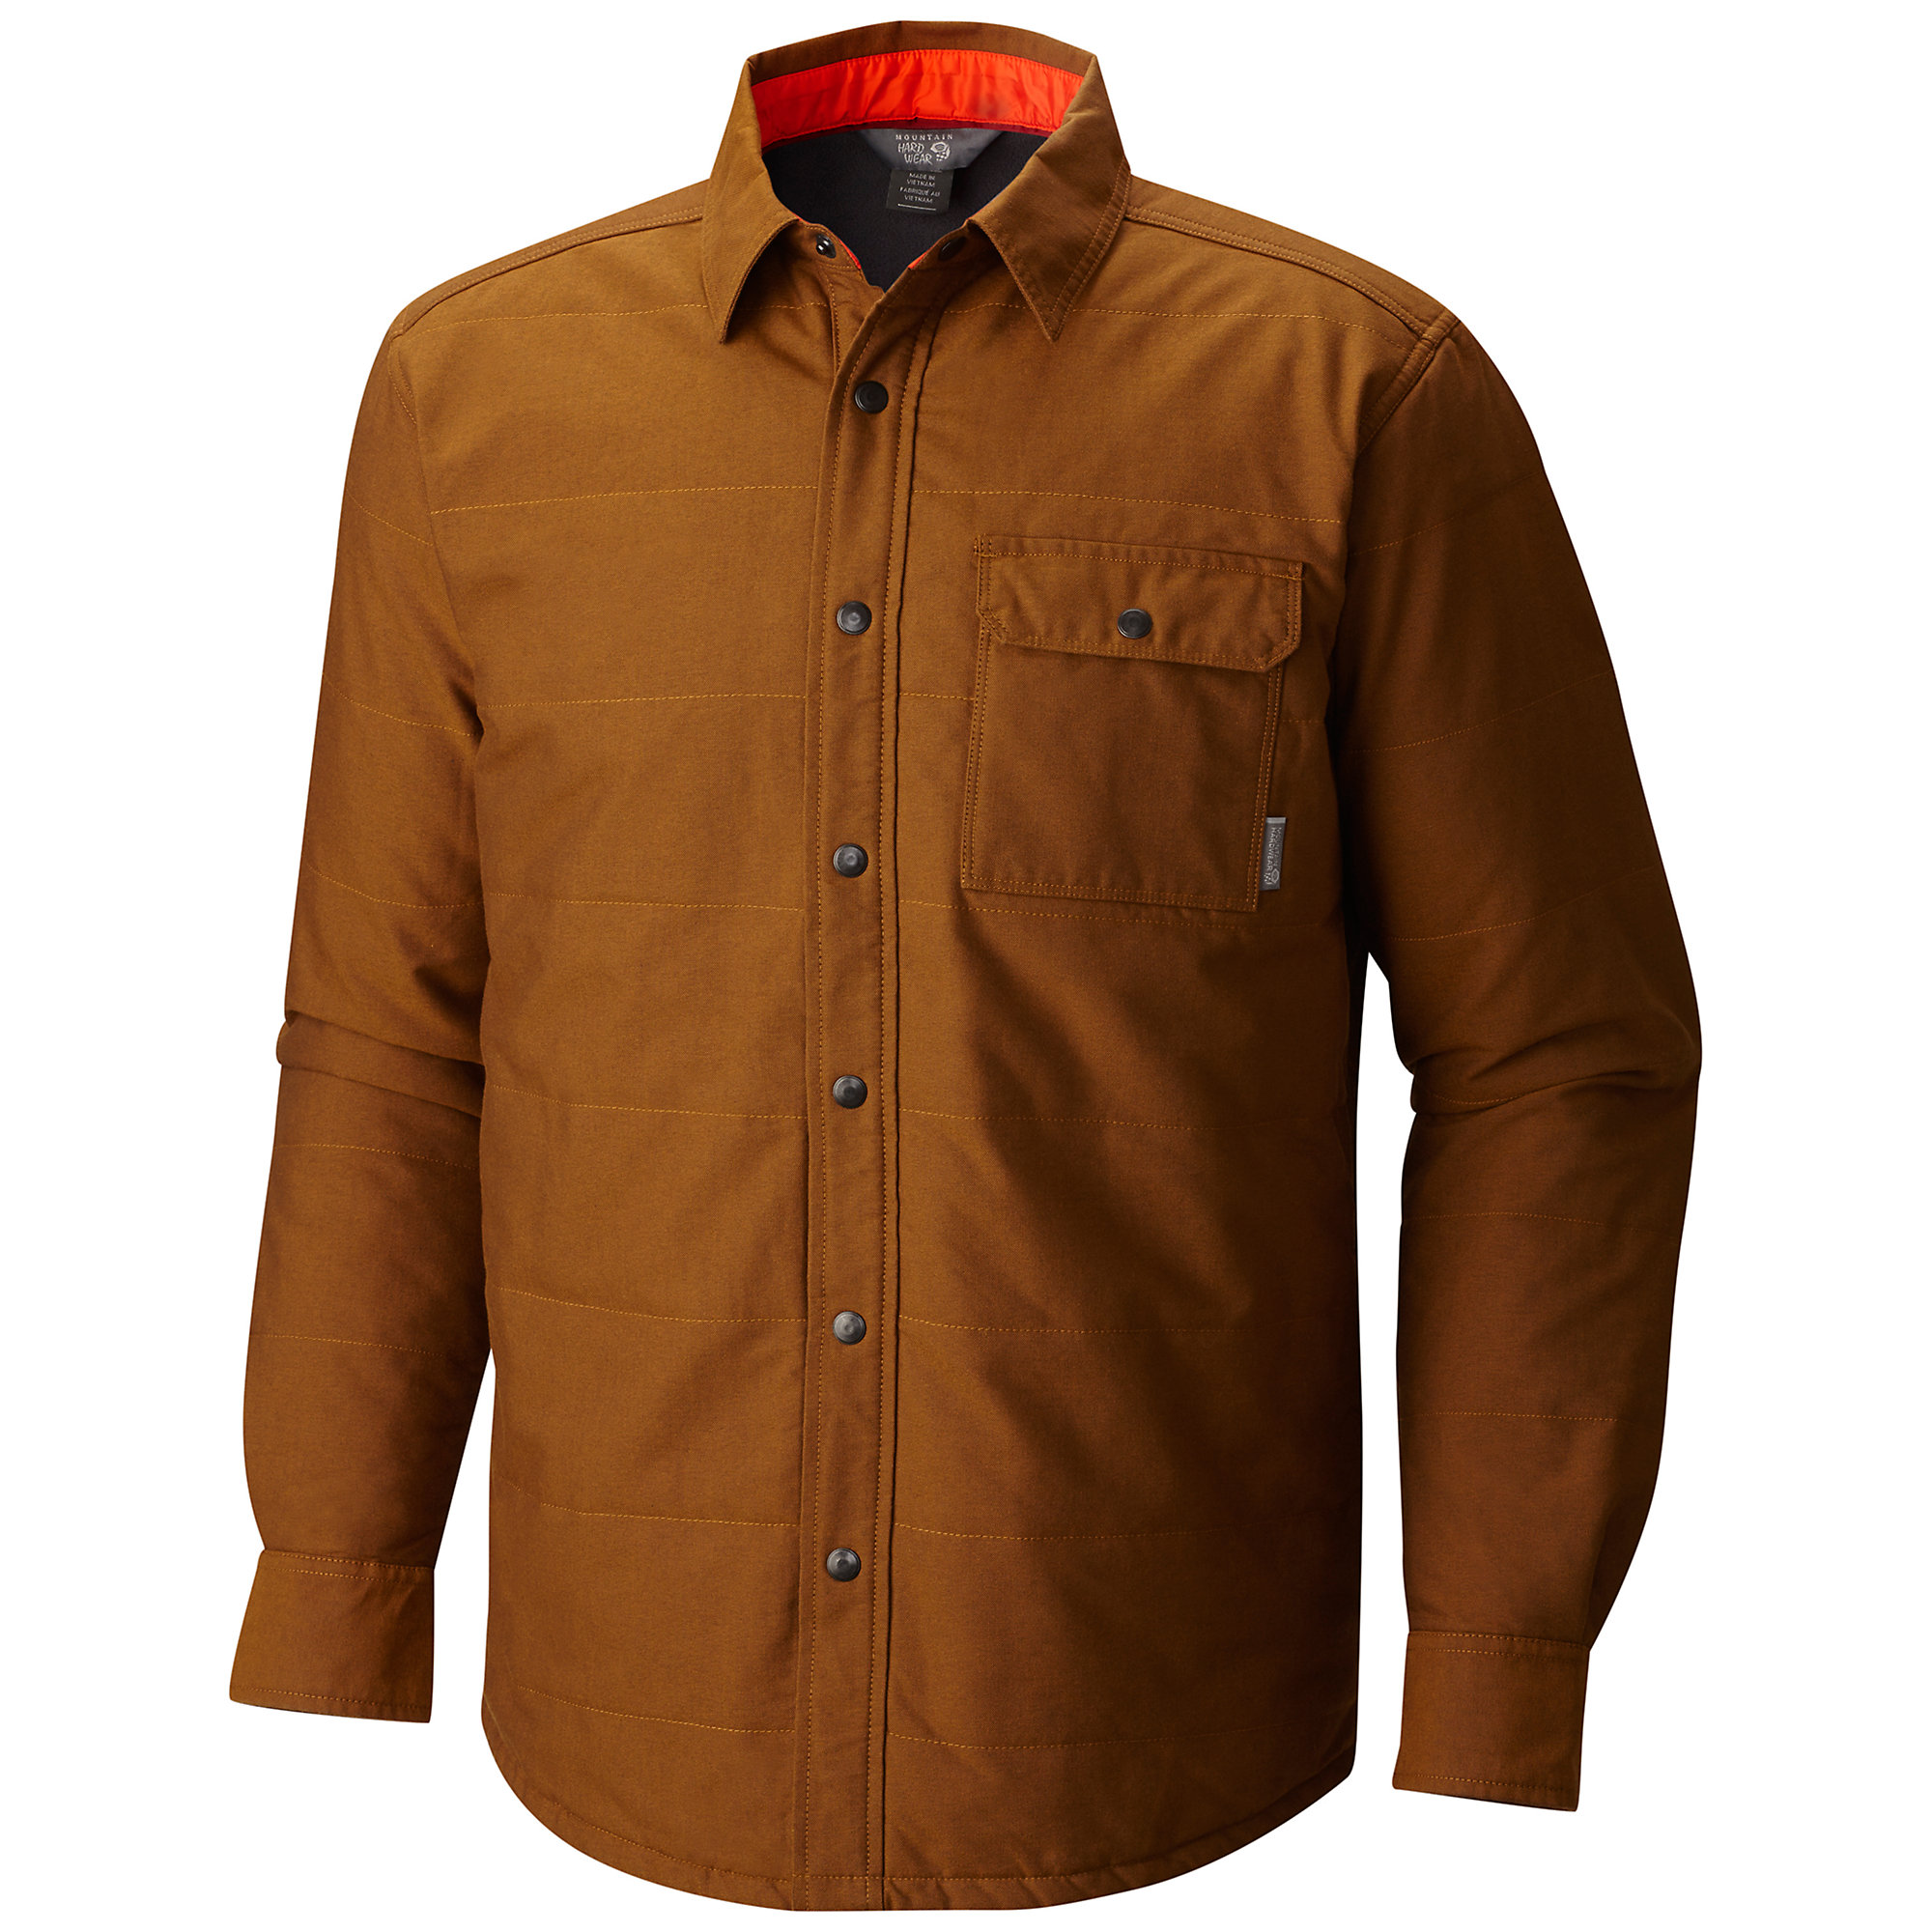 Mountain Hardwear Yuba Pass Fleece Lined Shacket